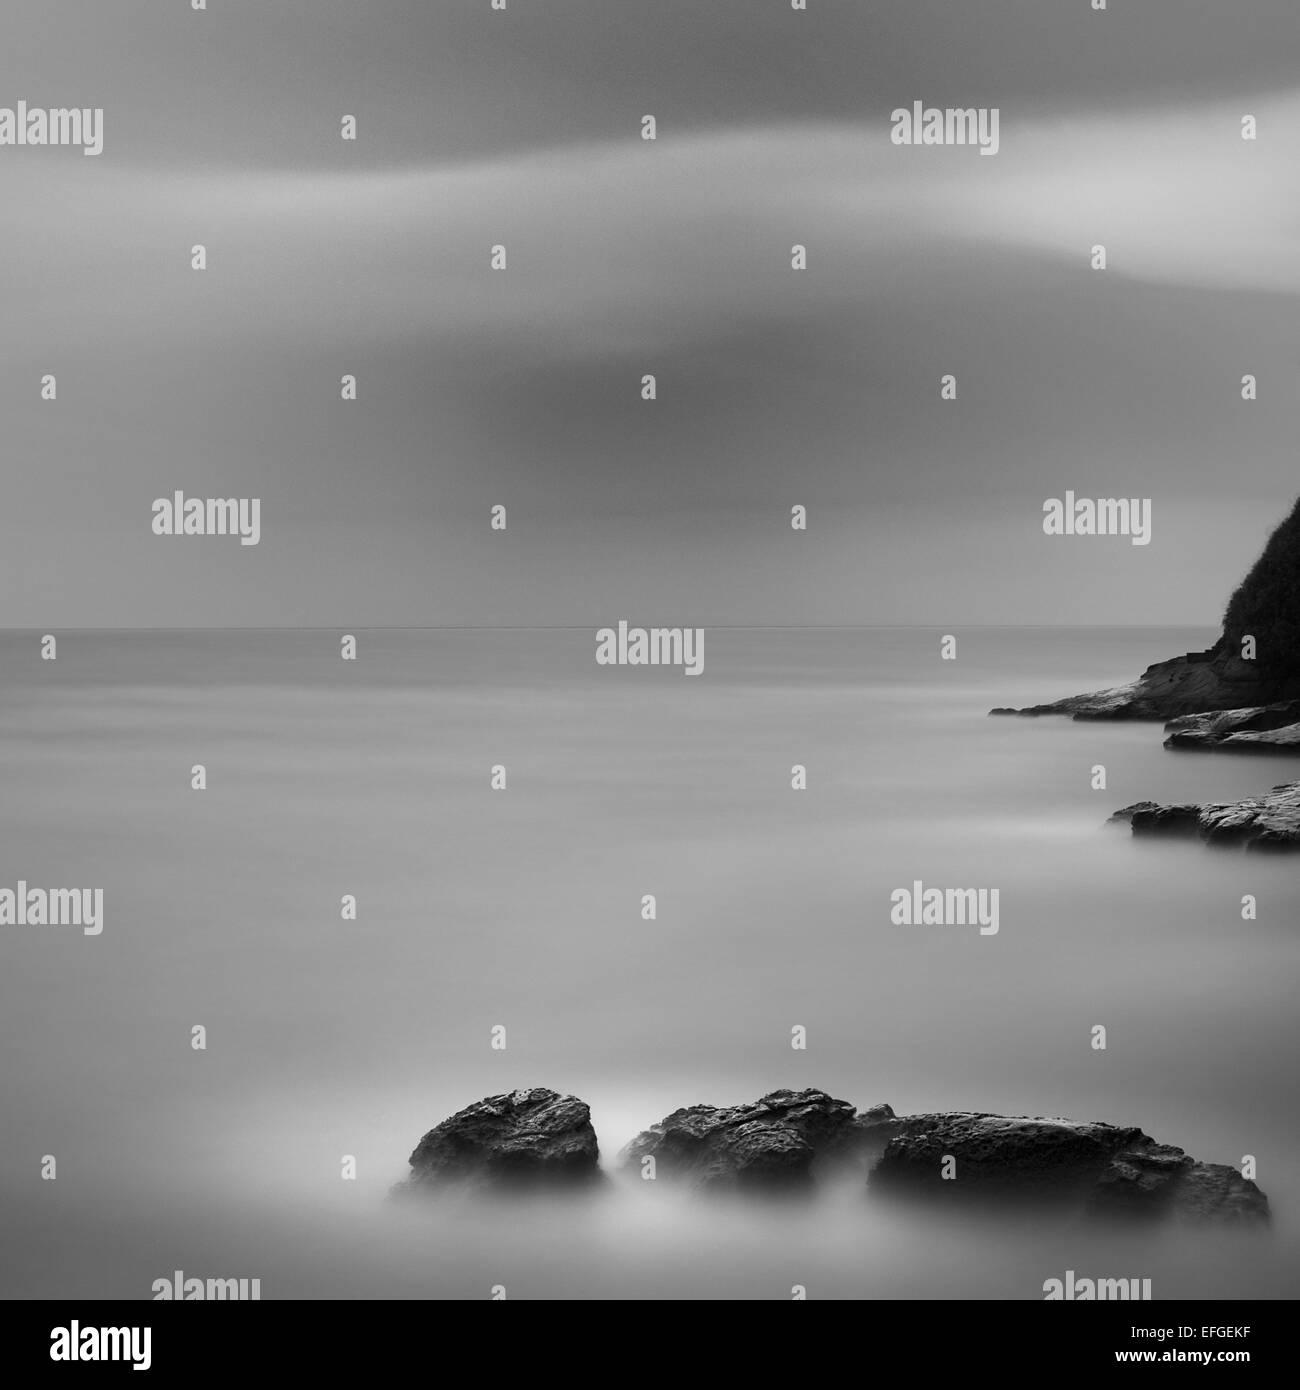 Cliff and sea rocks above the sea at Inamuragasaki, Kanagawa Prefecture, Japan - Stock Image